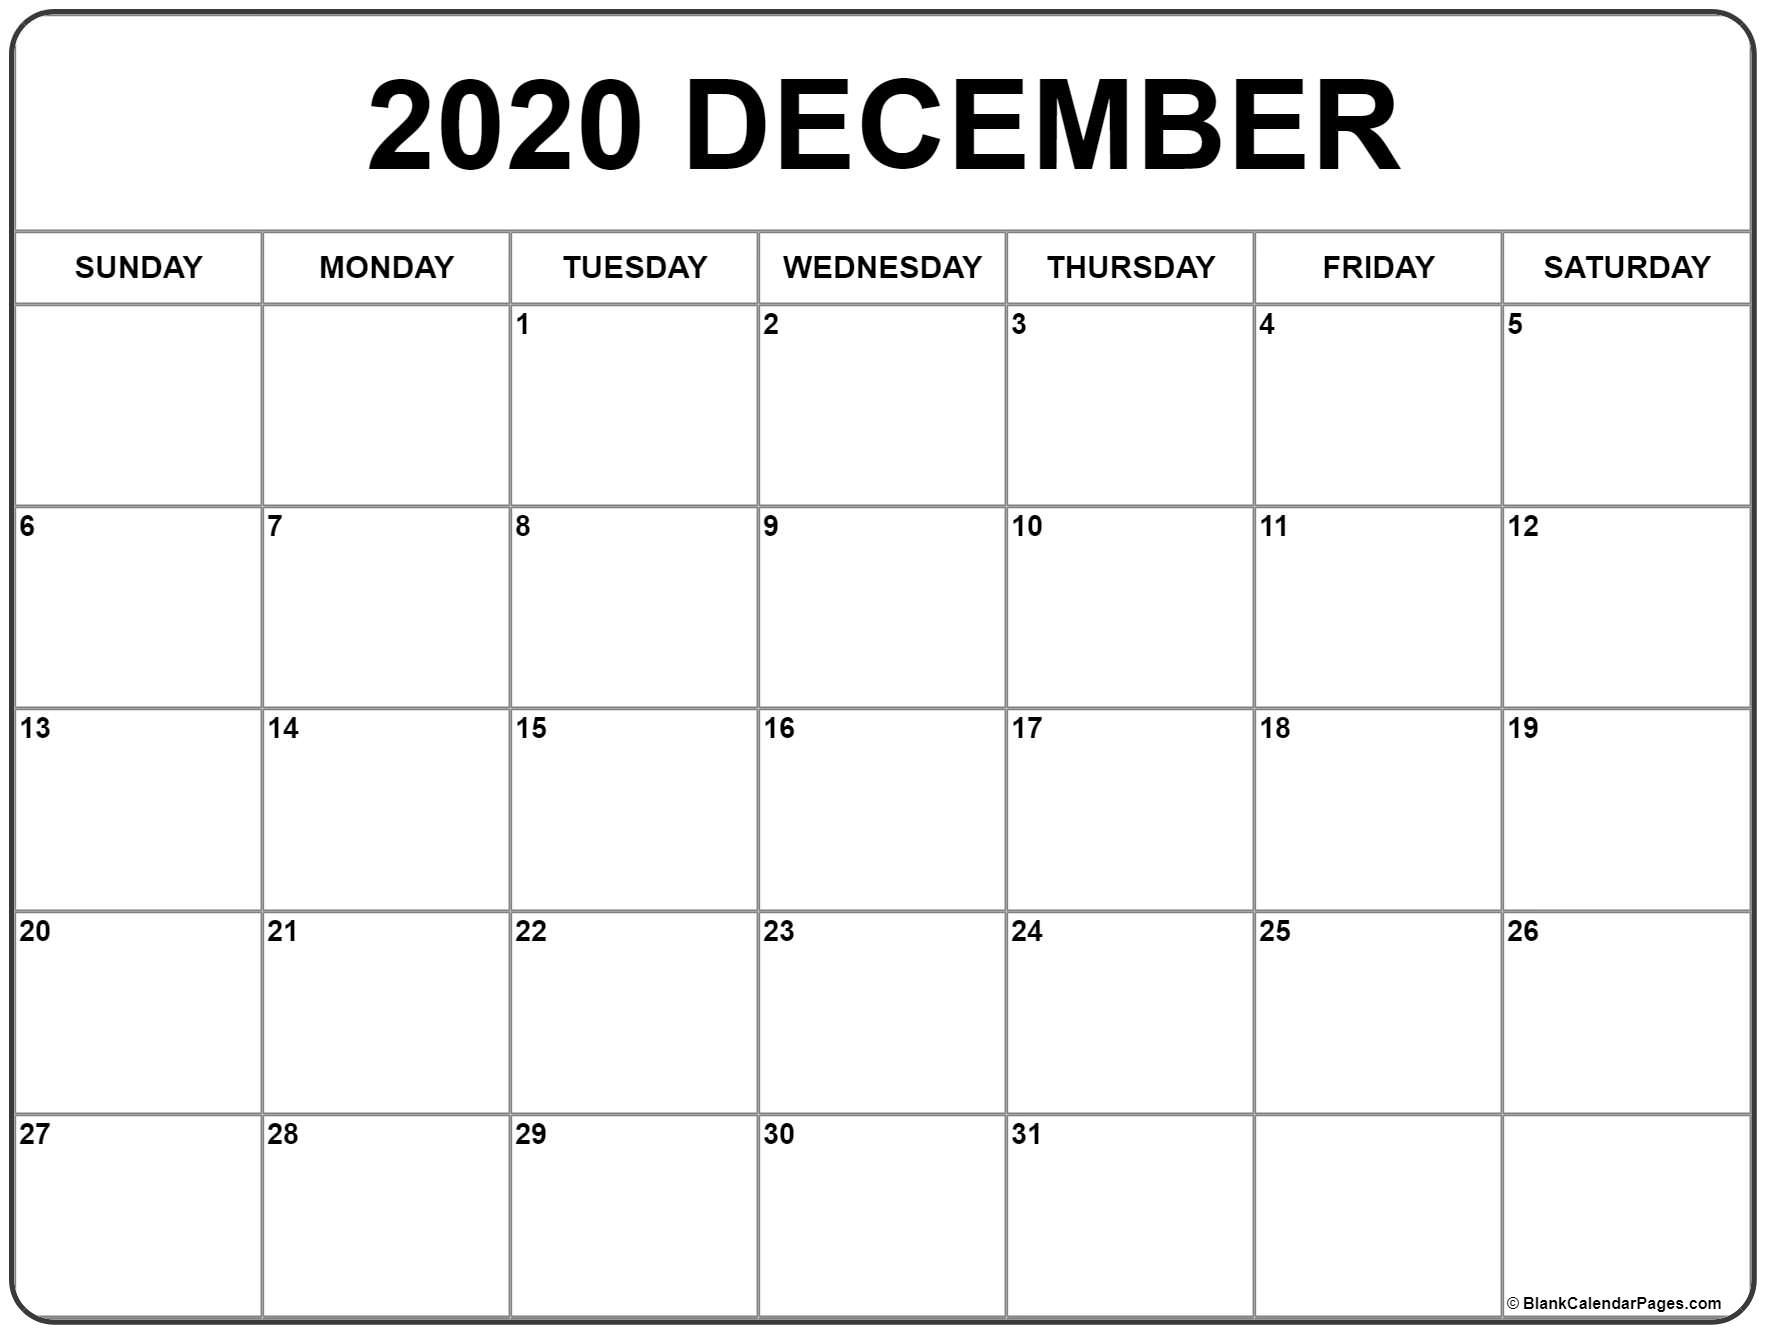 December 2020 Printable Calendar Template #2020Calendars inside 2020 Monthly Calendar Monday Start Printable